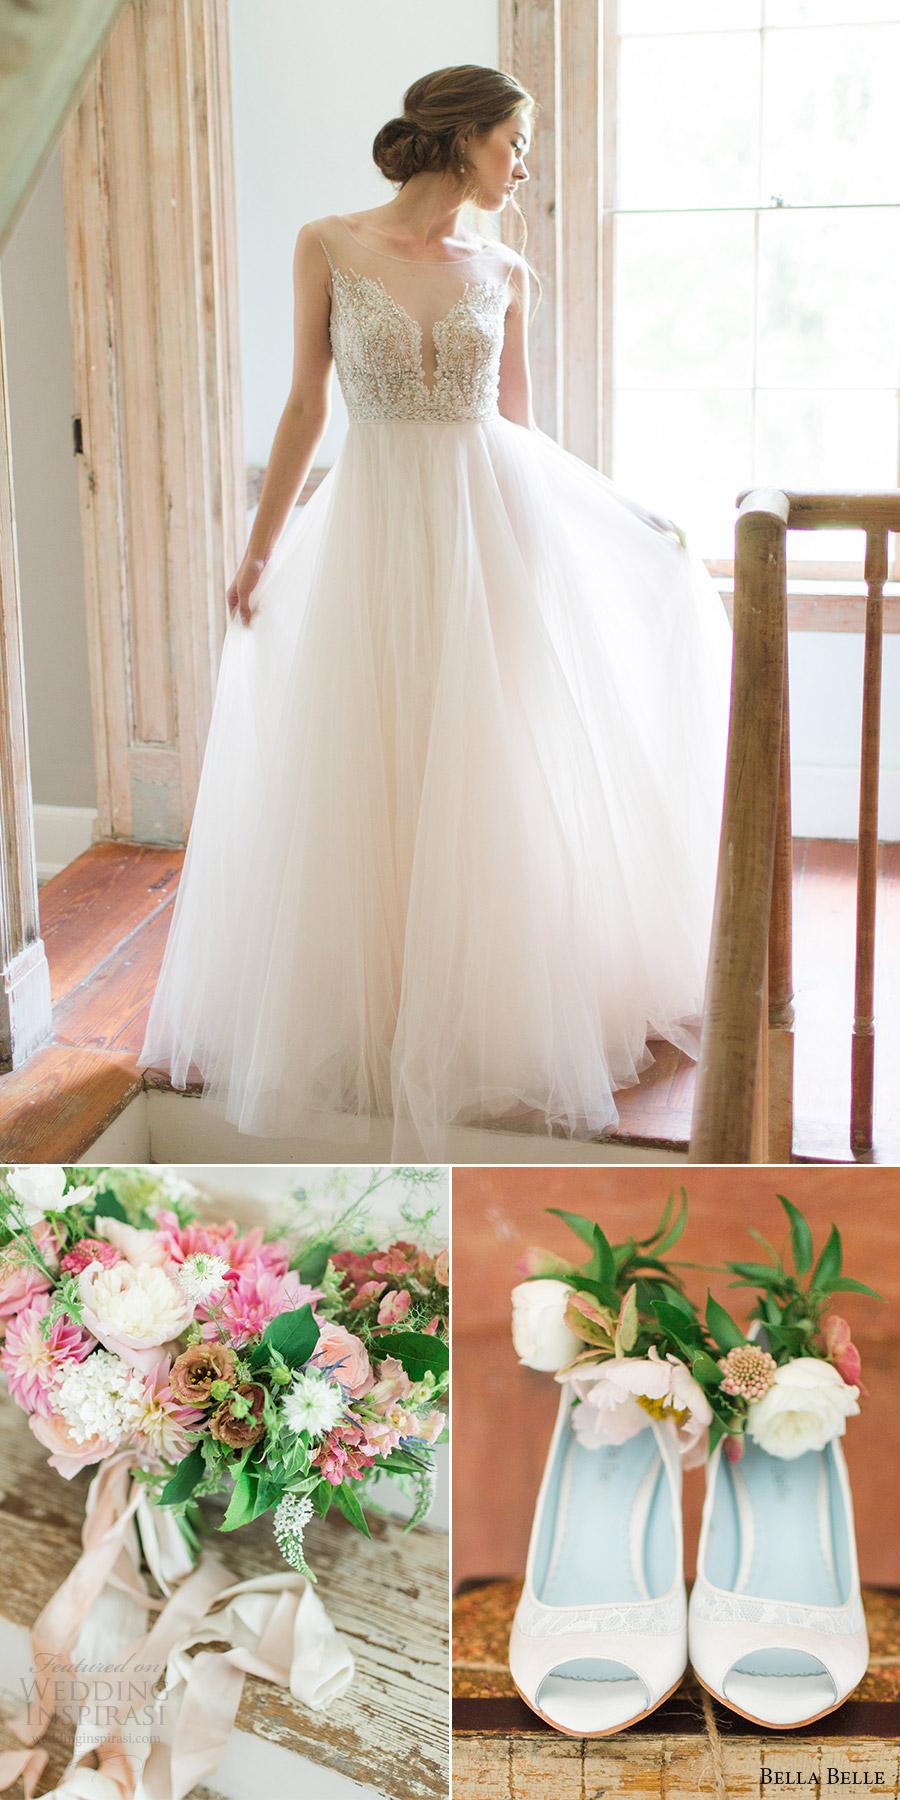 bella belle bridal shoes 2016 miranda wedding shoes heel watters gown